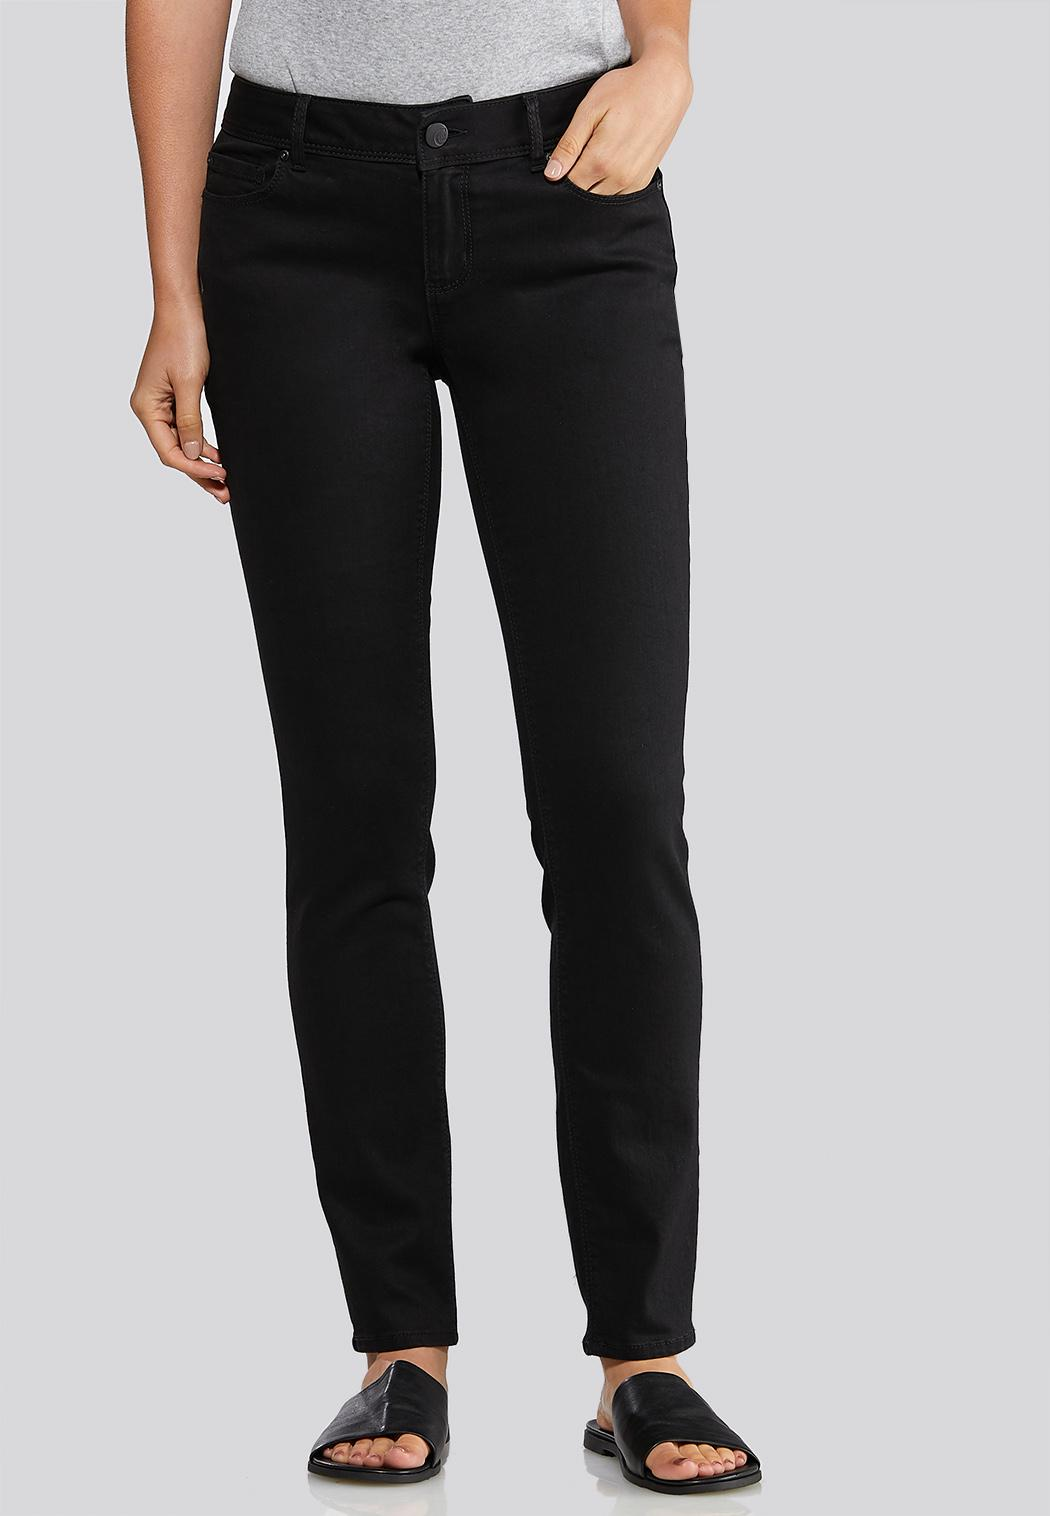 Black Skinny Leg Jeans